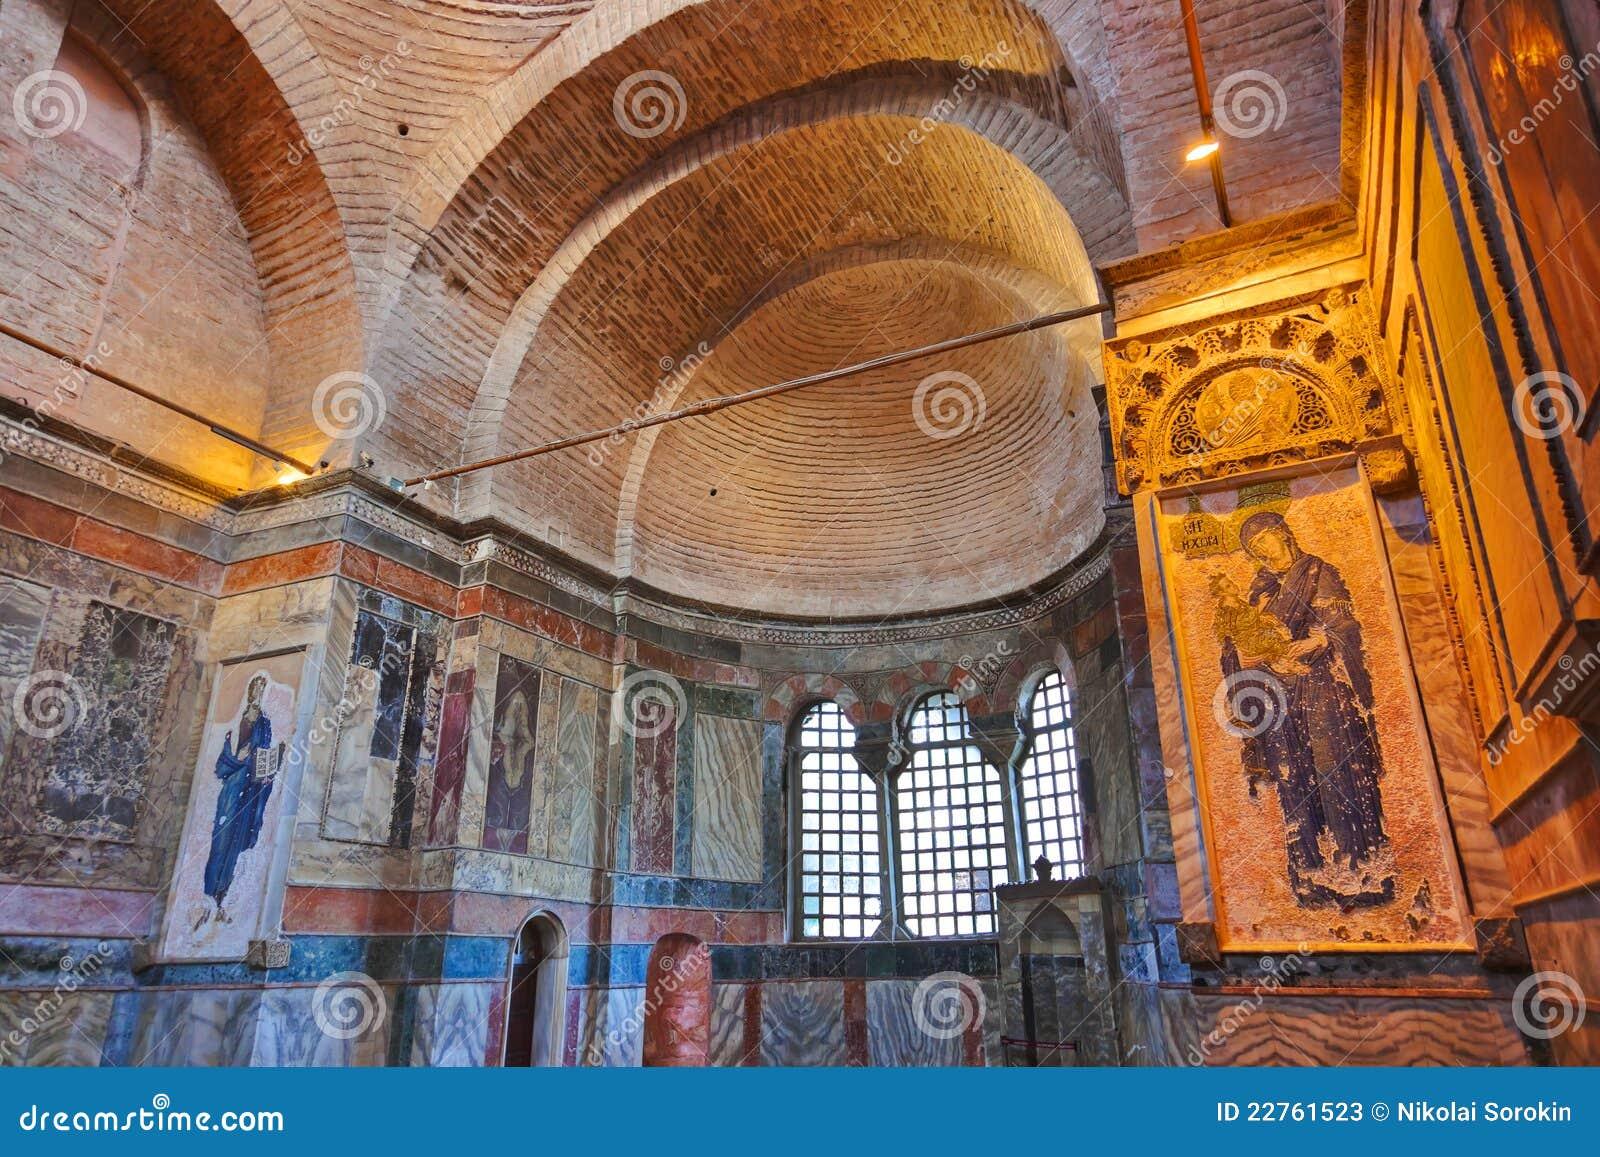 Mosaic Interior In Chora Church At Istanbul Turkey Stock Photos - Image: 2276...